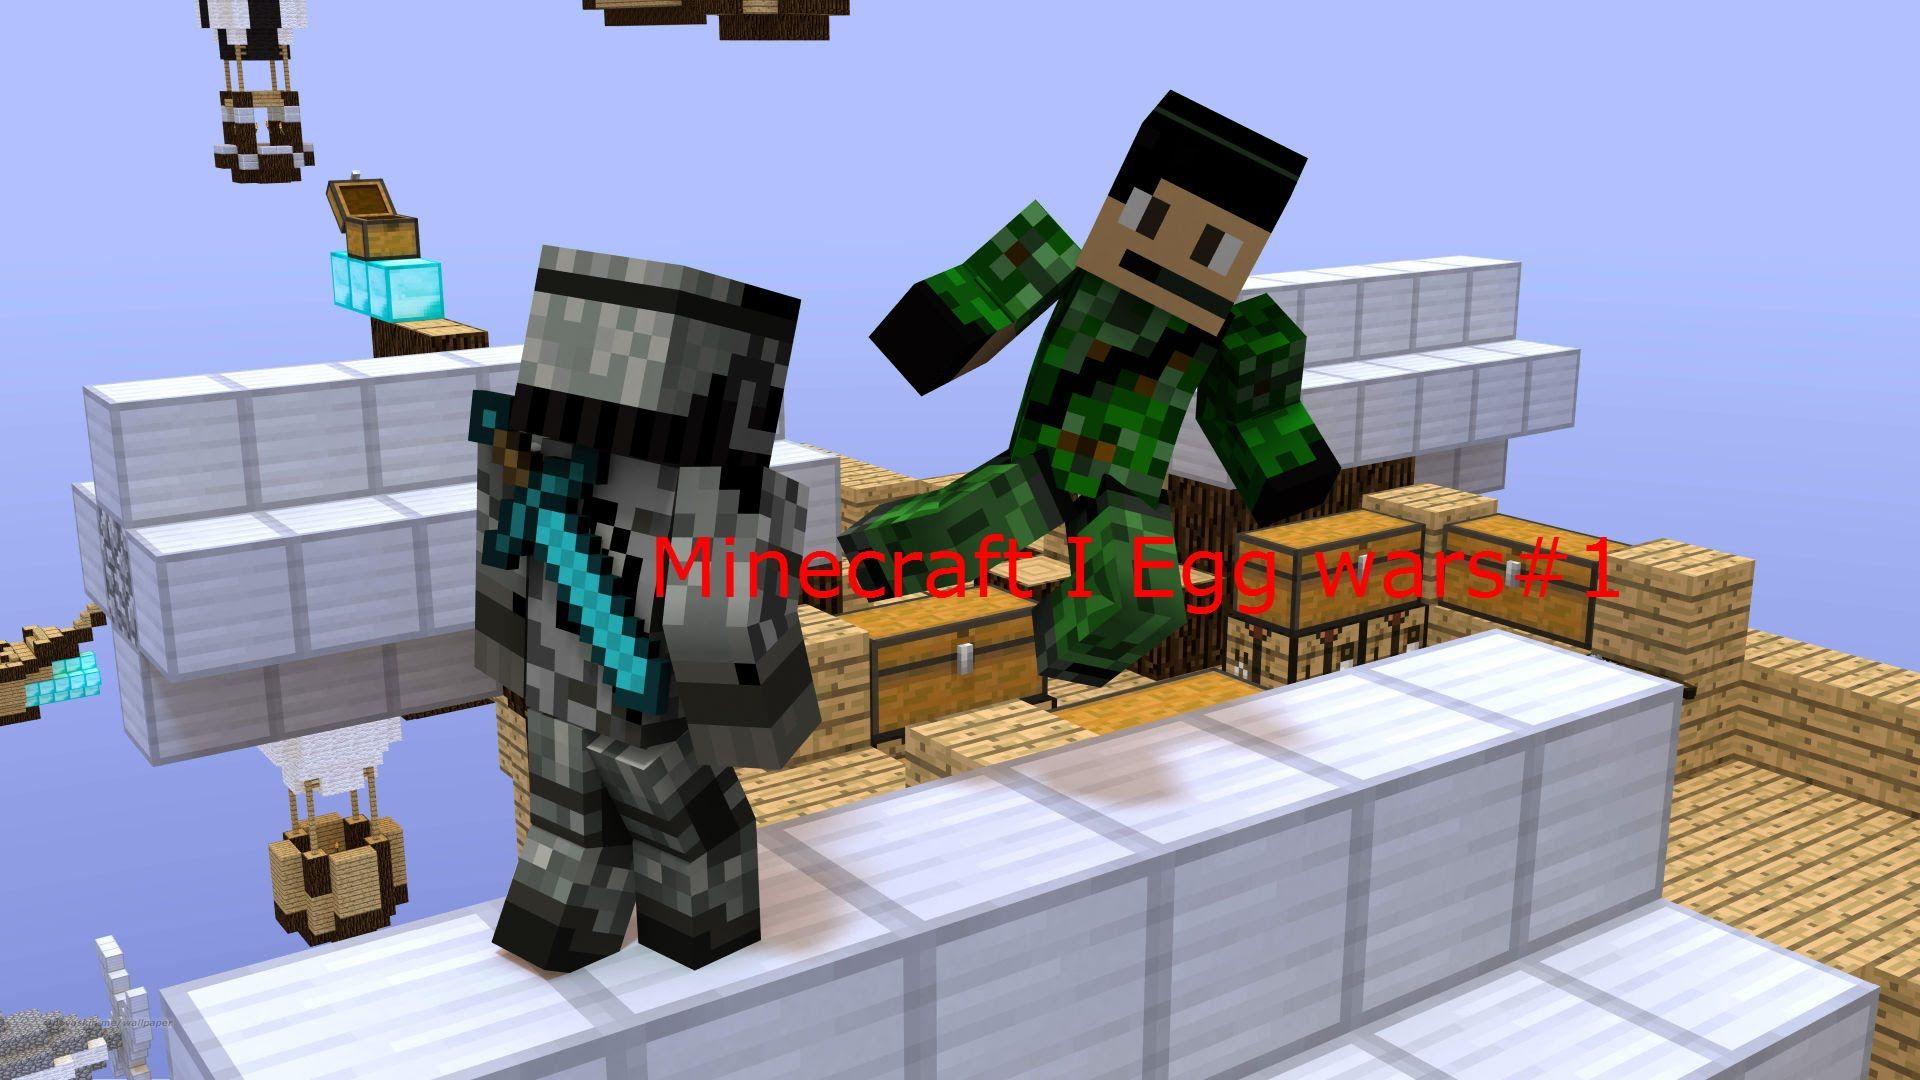 Top Wallpaper Minecraft War - a820f1c71afcac396f491303717aba78  Pic_142187.jpg